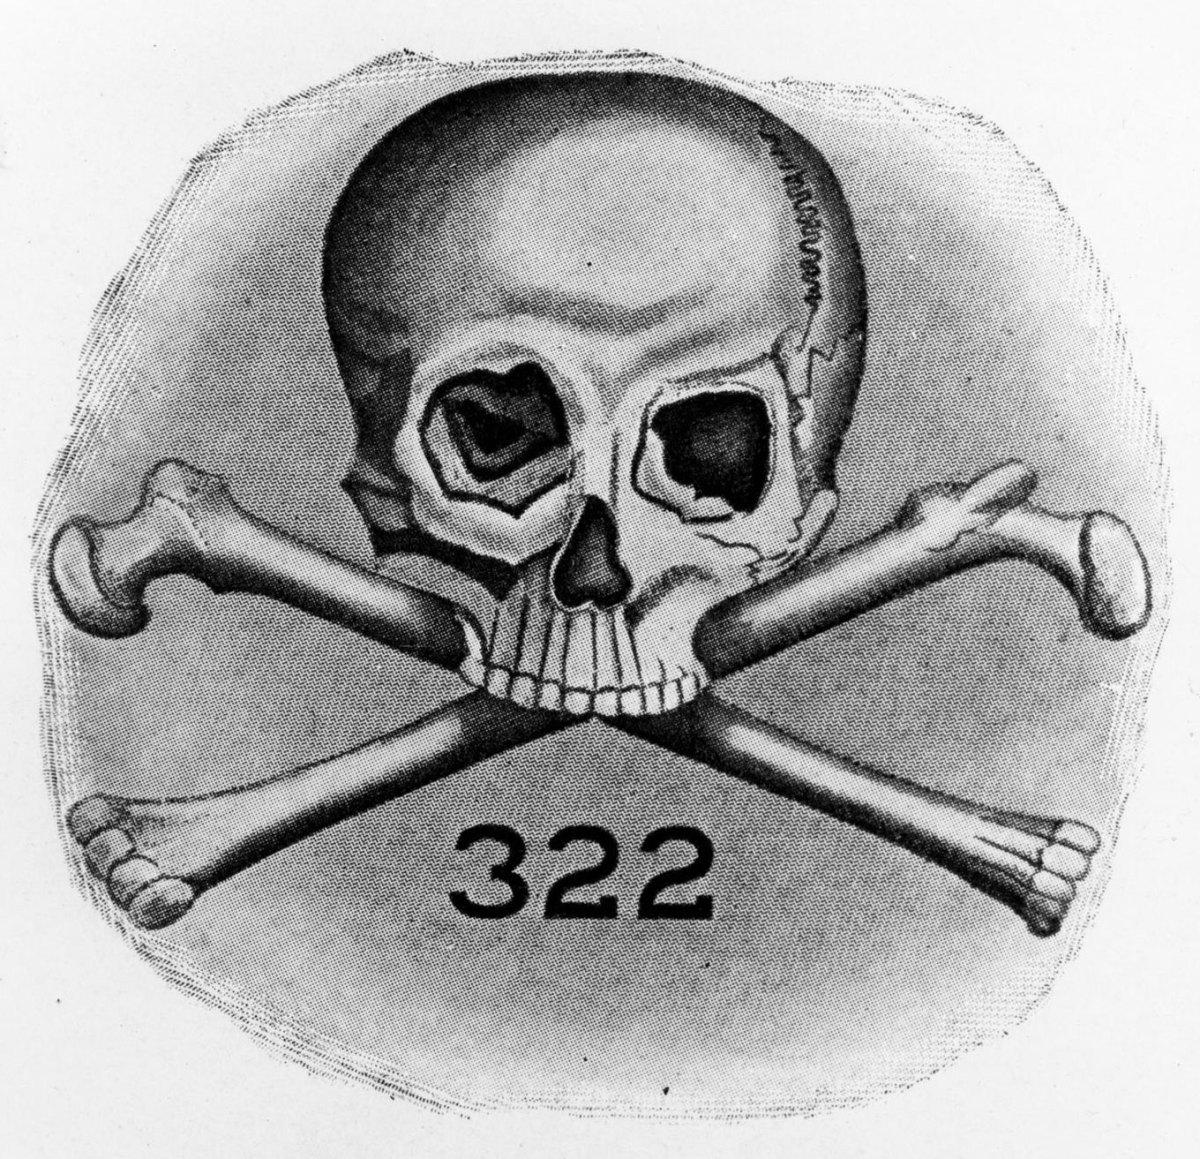 skull-and-bones-symbol-yale